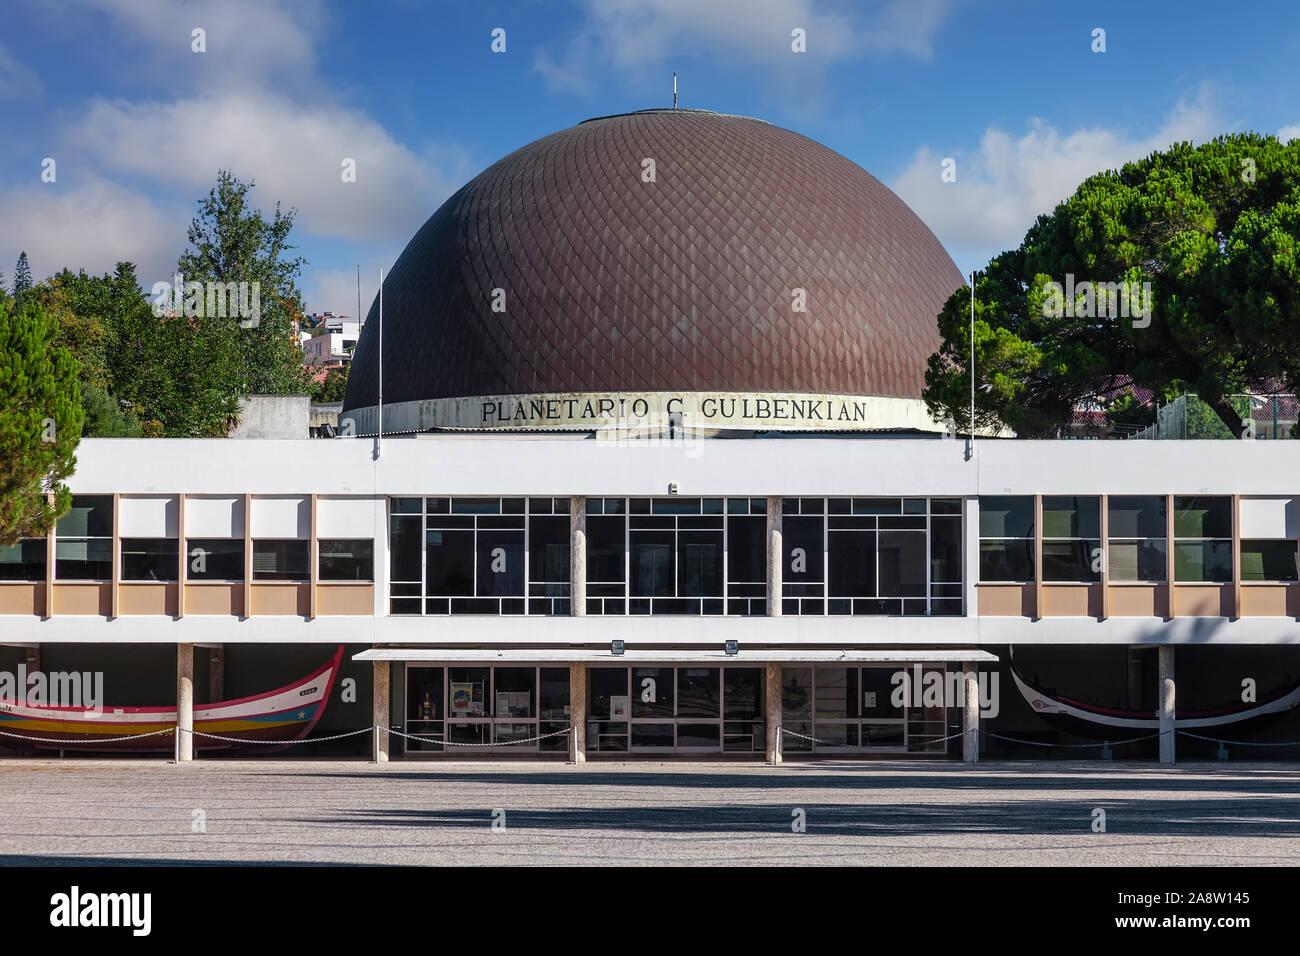 Lisbon, Portugal. Planetario de Lisboa Planetarium aka Calouste Gulbenkian Planetarium Astronomy science and universe education. Belem District Stock Photo